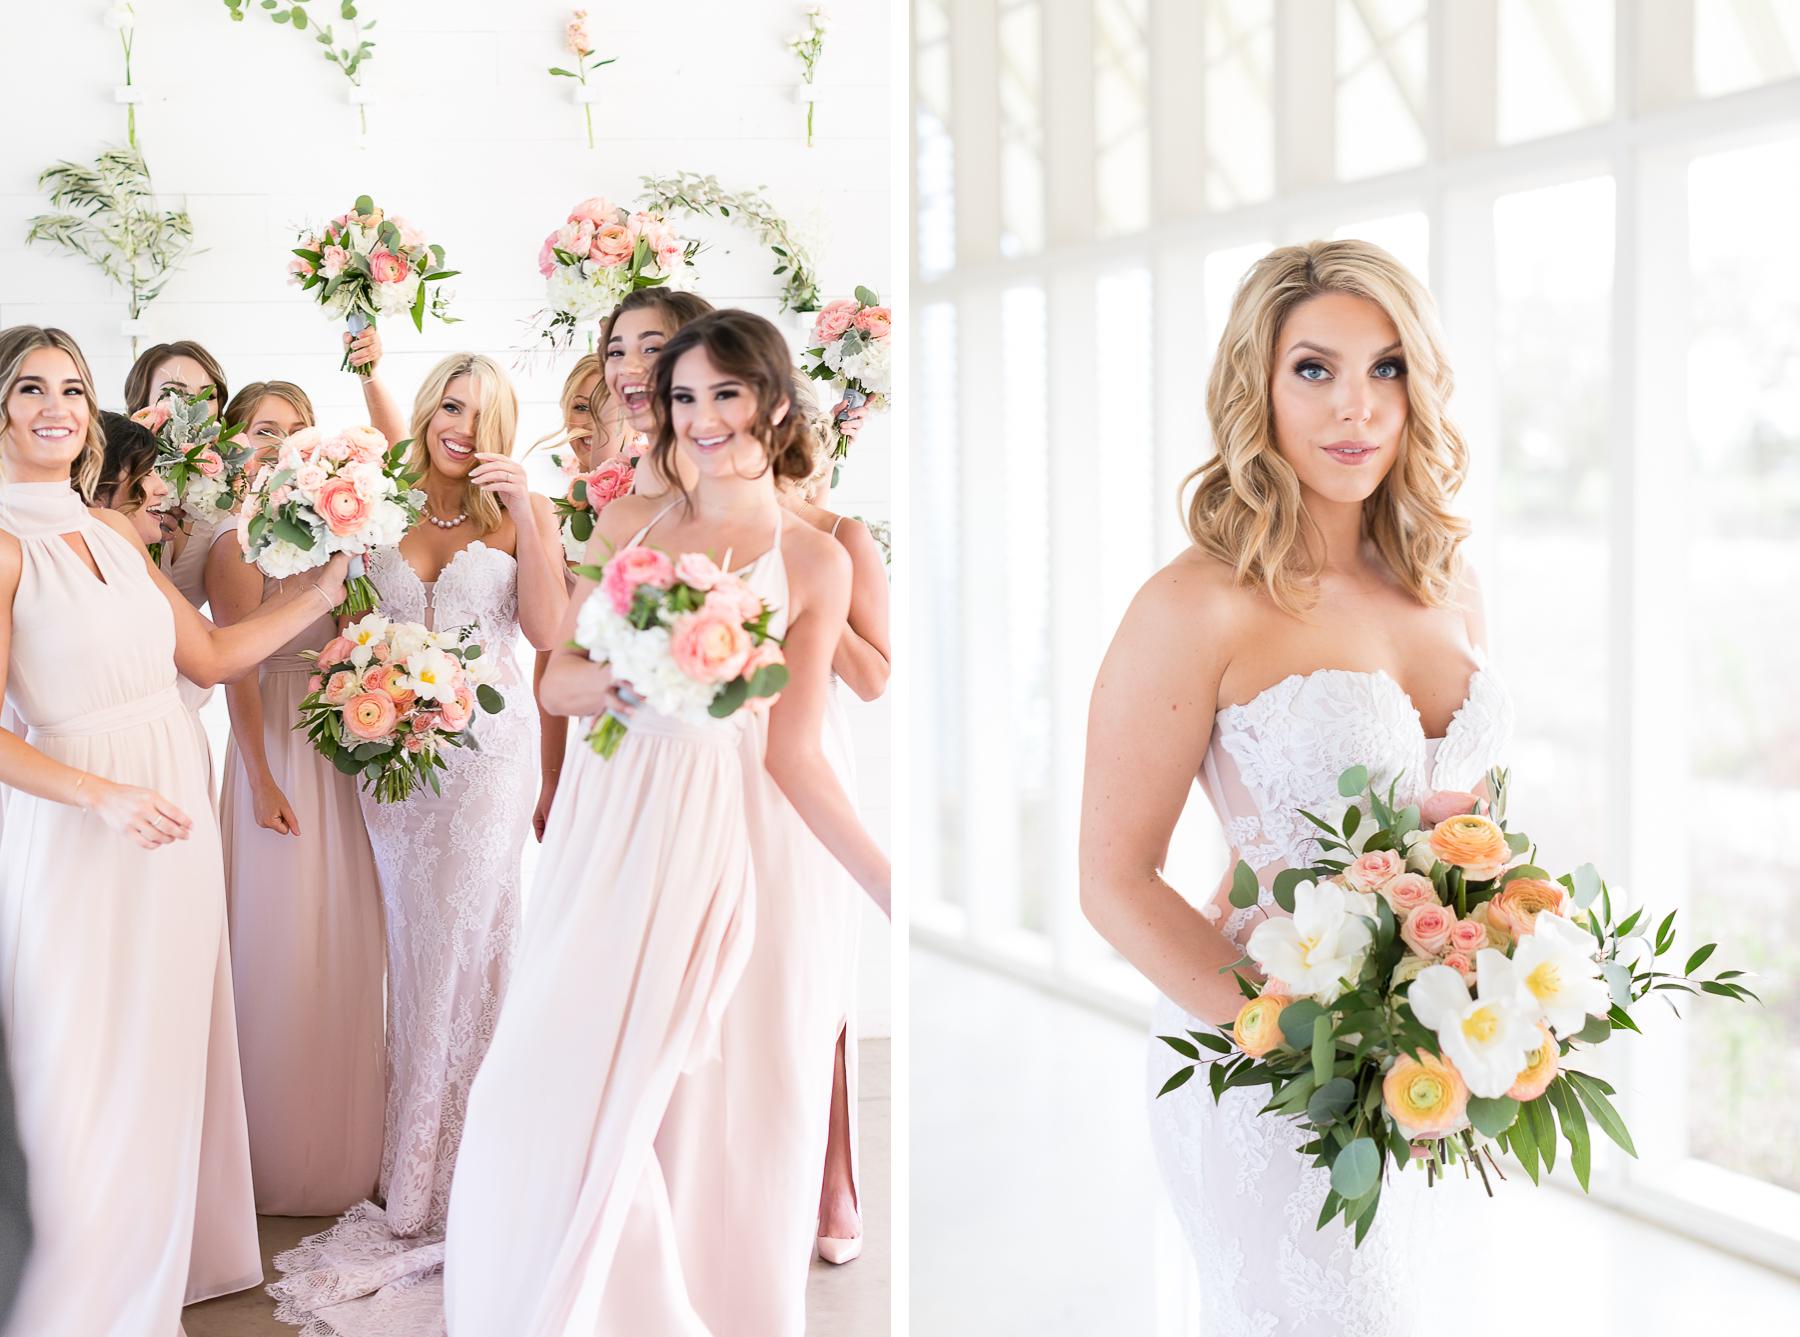 Bridal-portraits-prospect-house.jpg